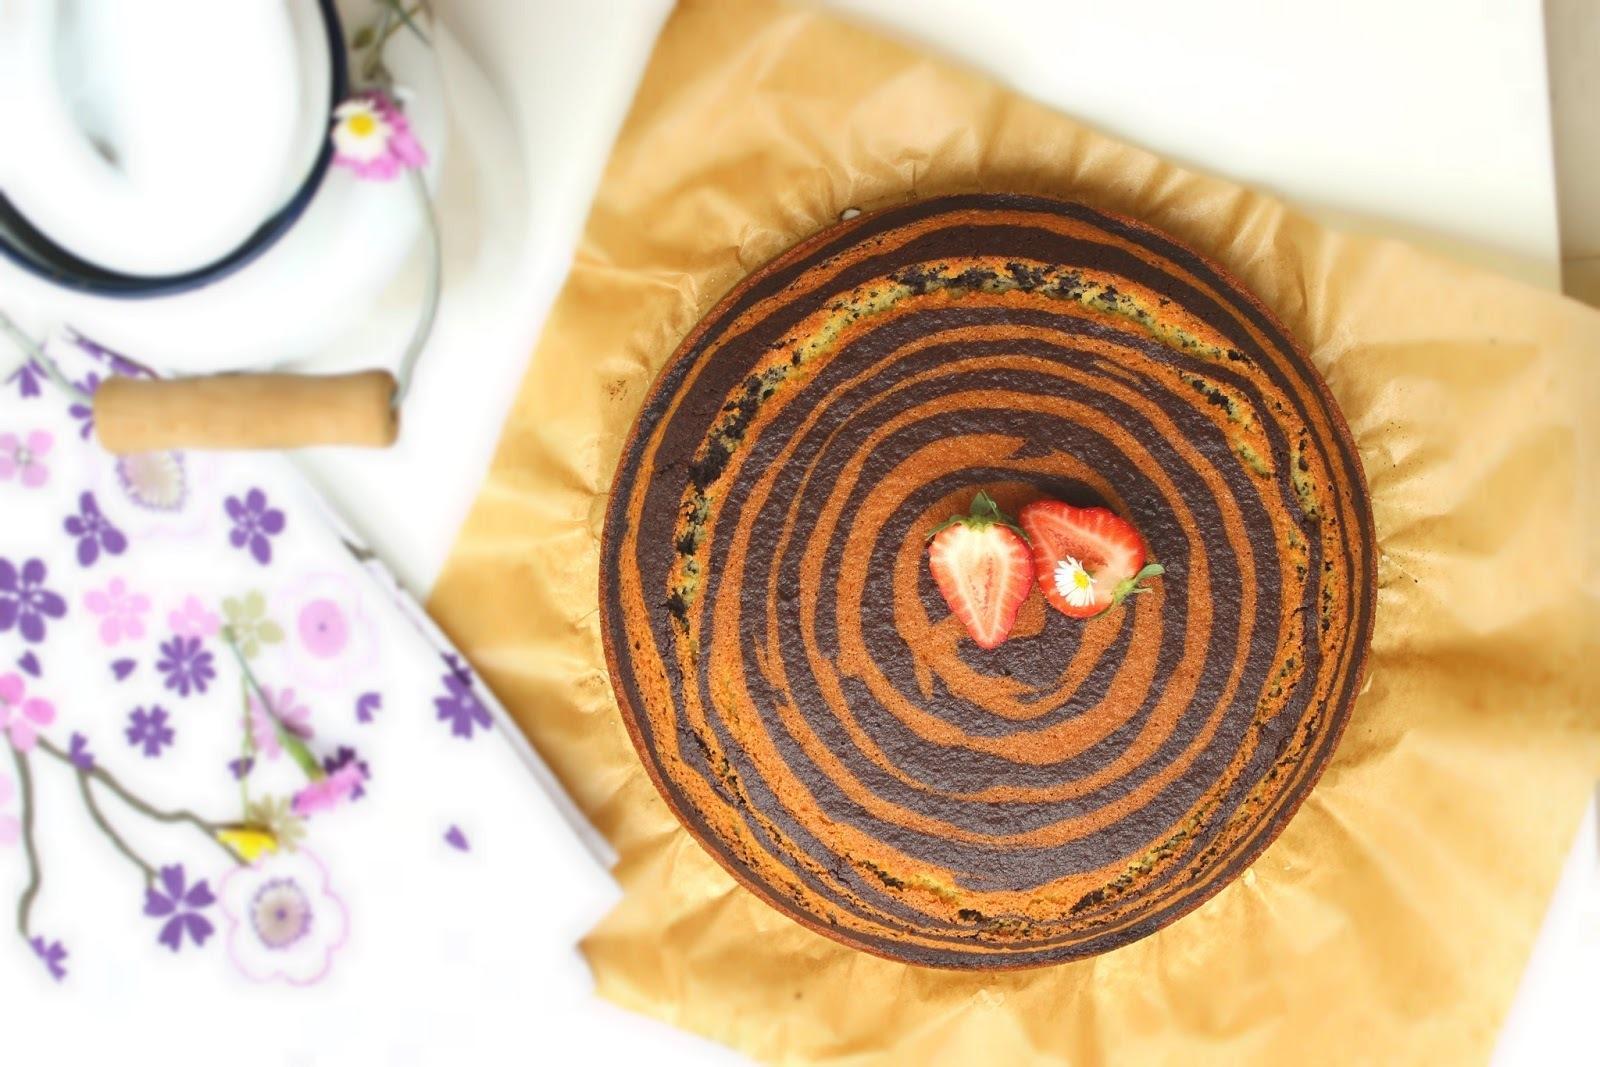 Zebra kolač - Lorraine Pascale / Zebra Cake